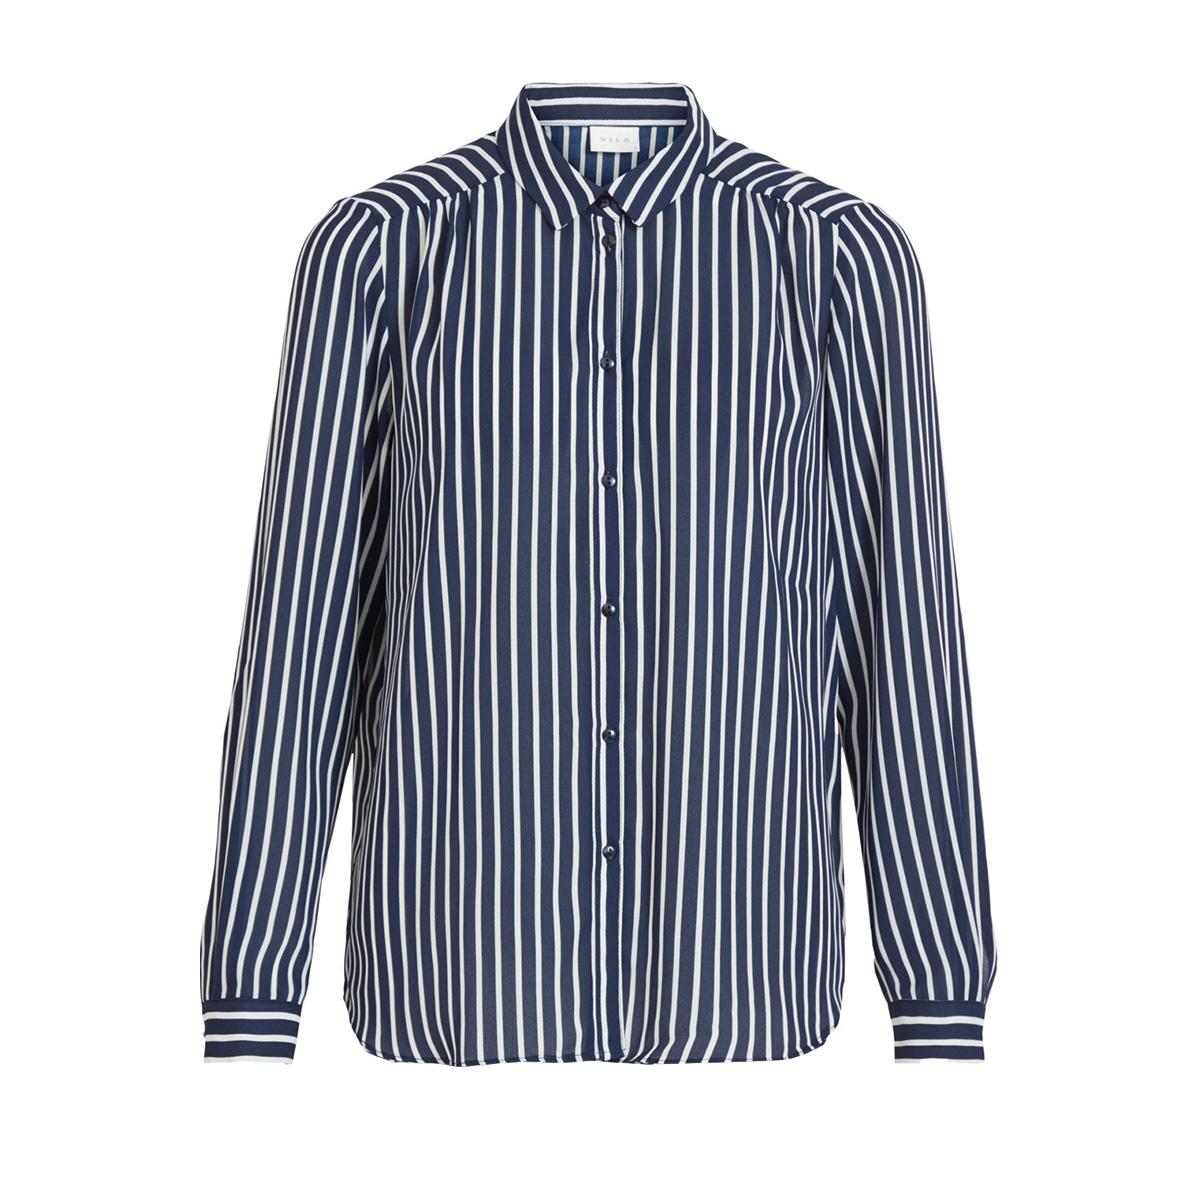 vilucy button l/s shirt - fav lux 14055561 vila blouse navy blazer/snow white